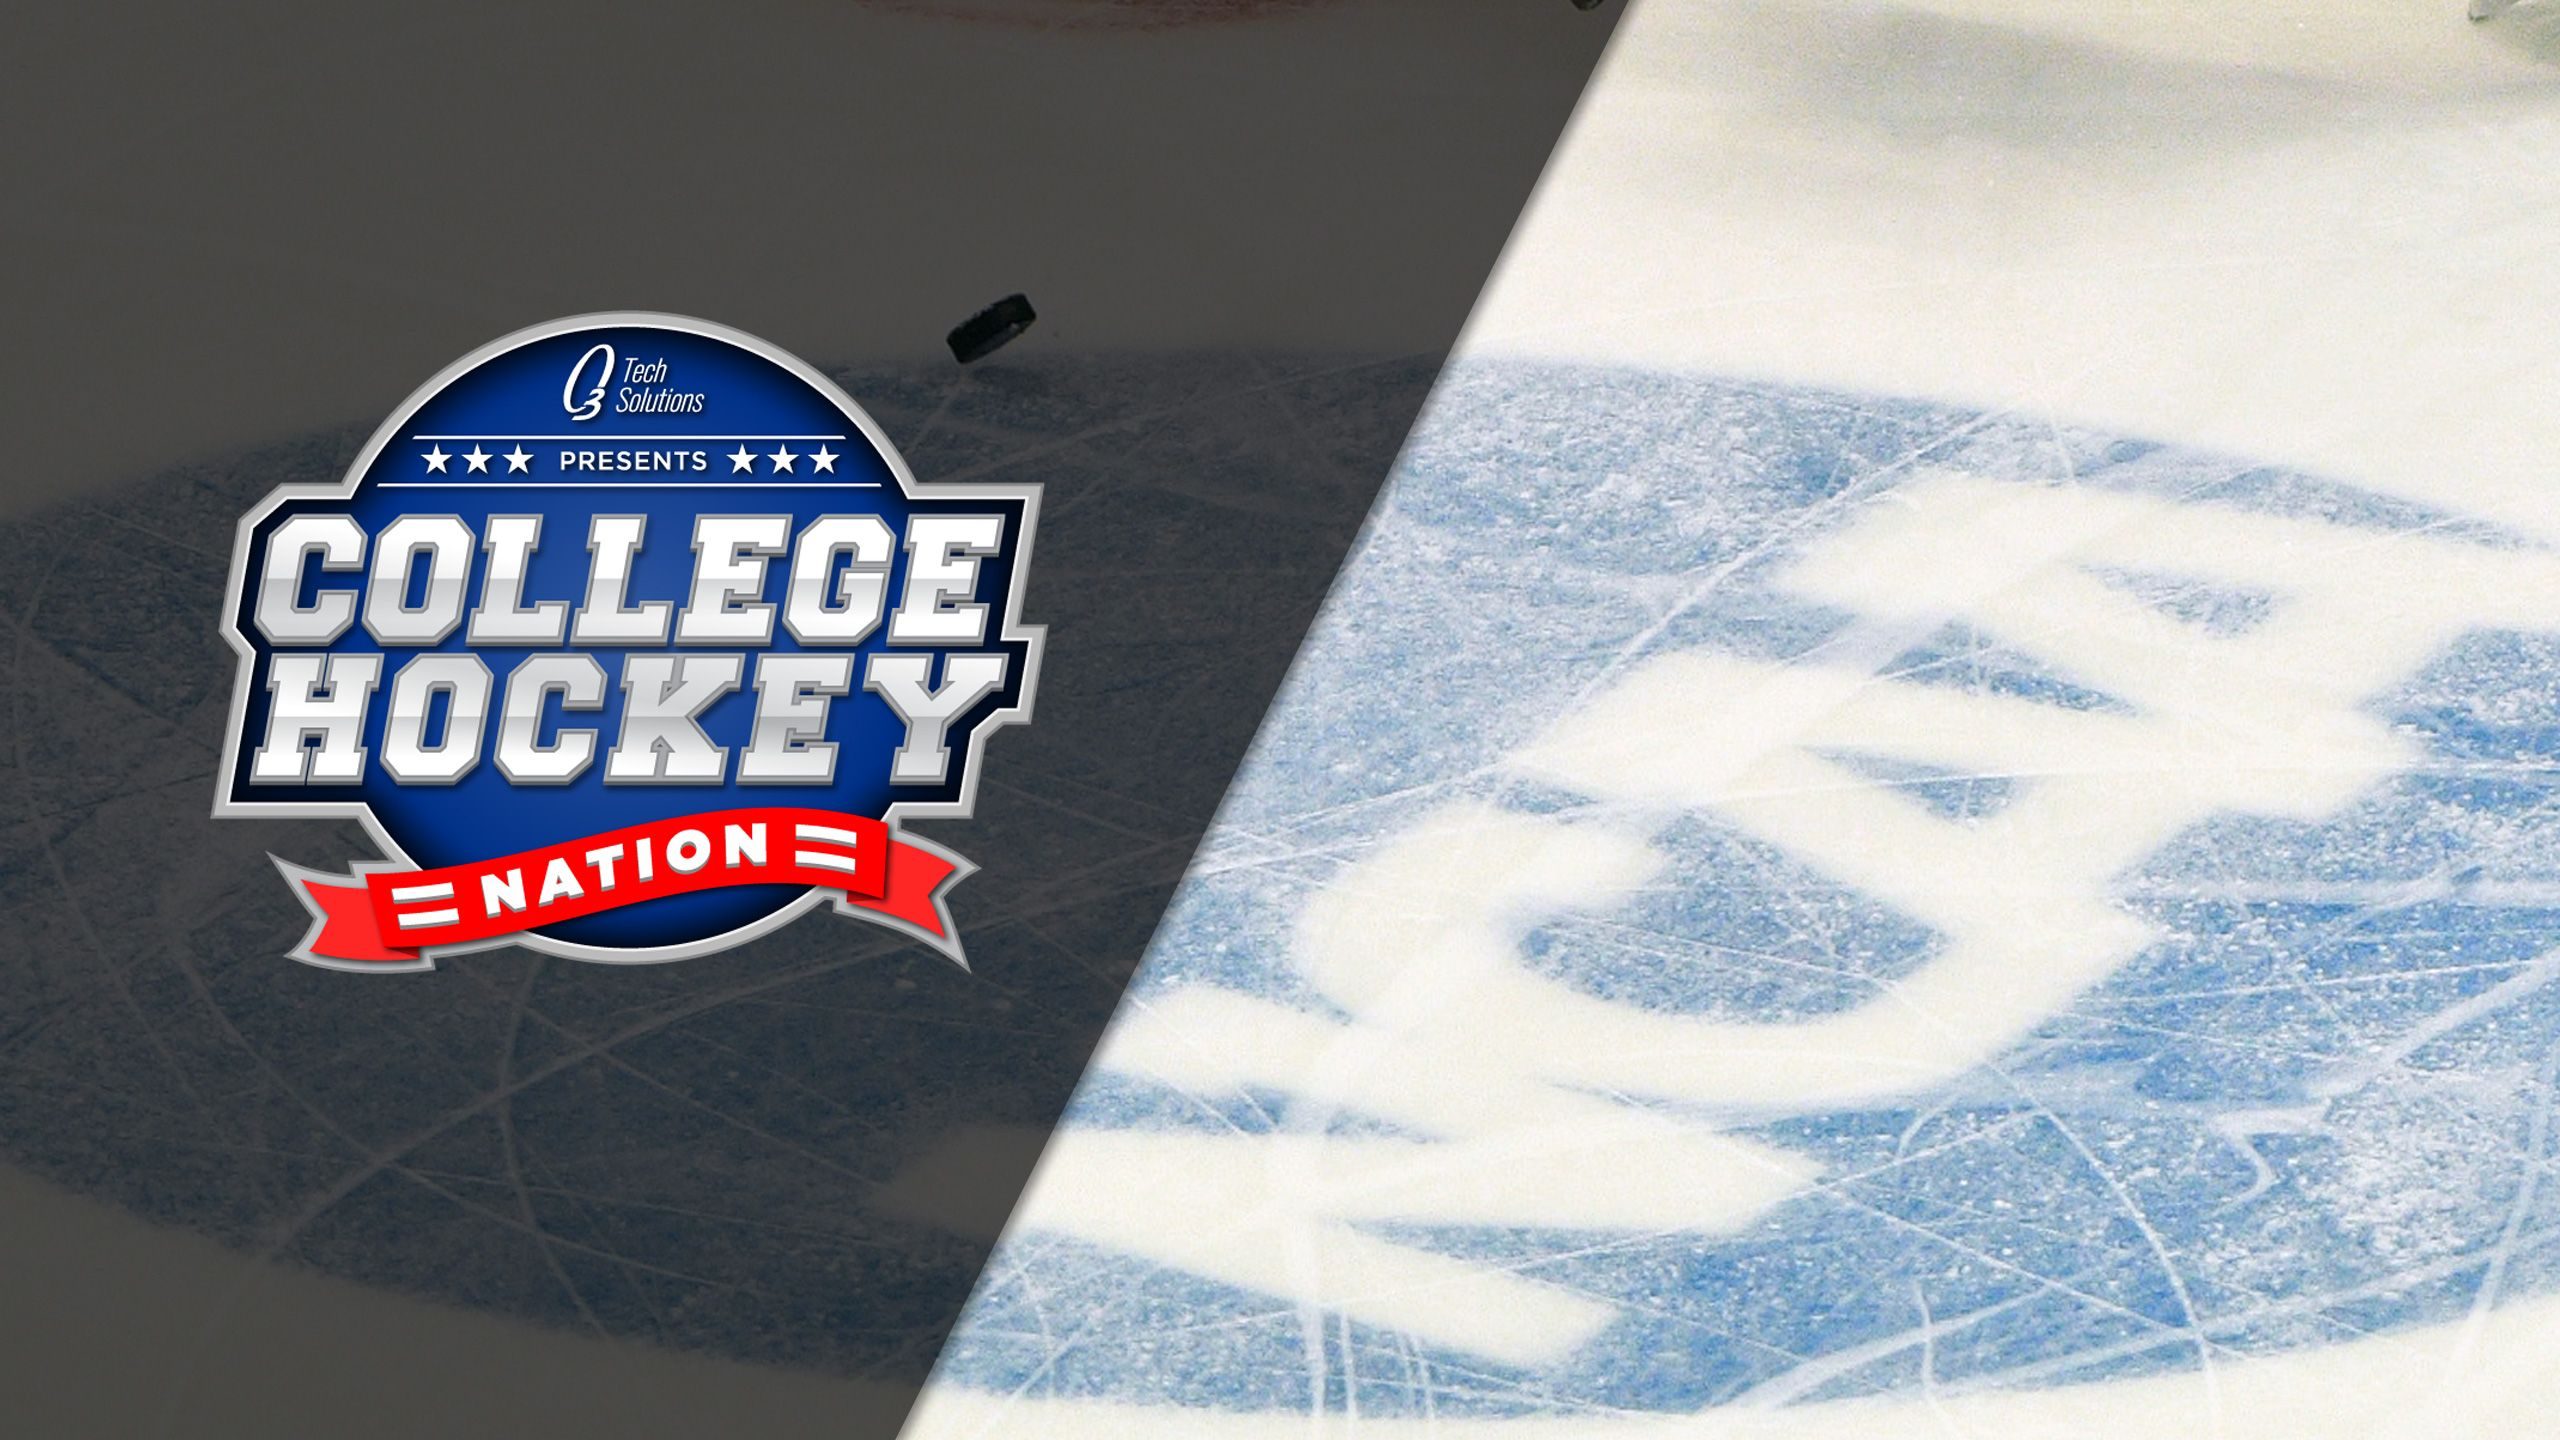 College Hockey Nation: Episode 4